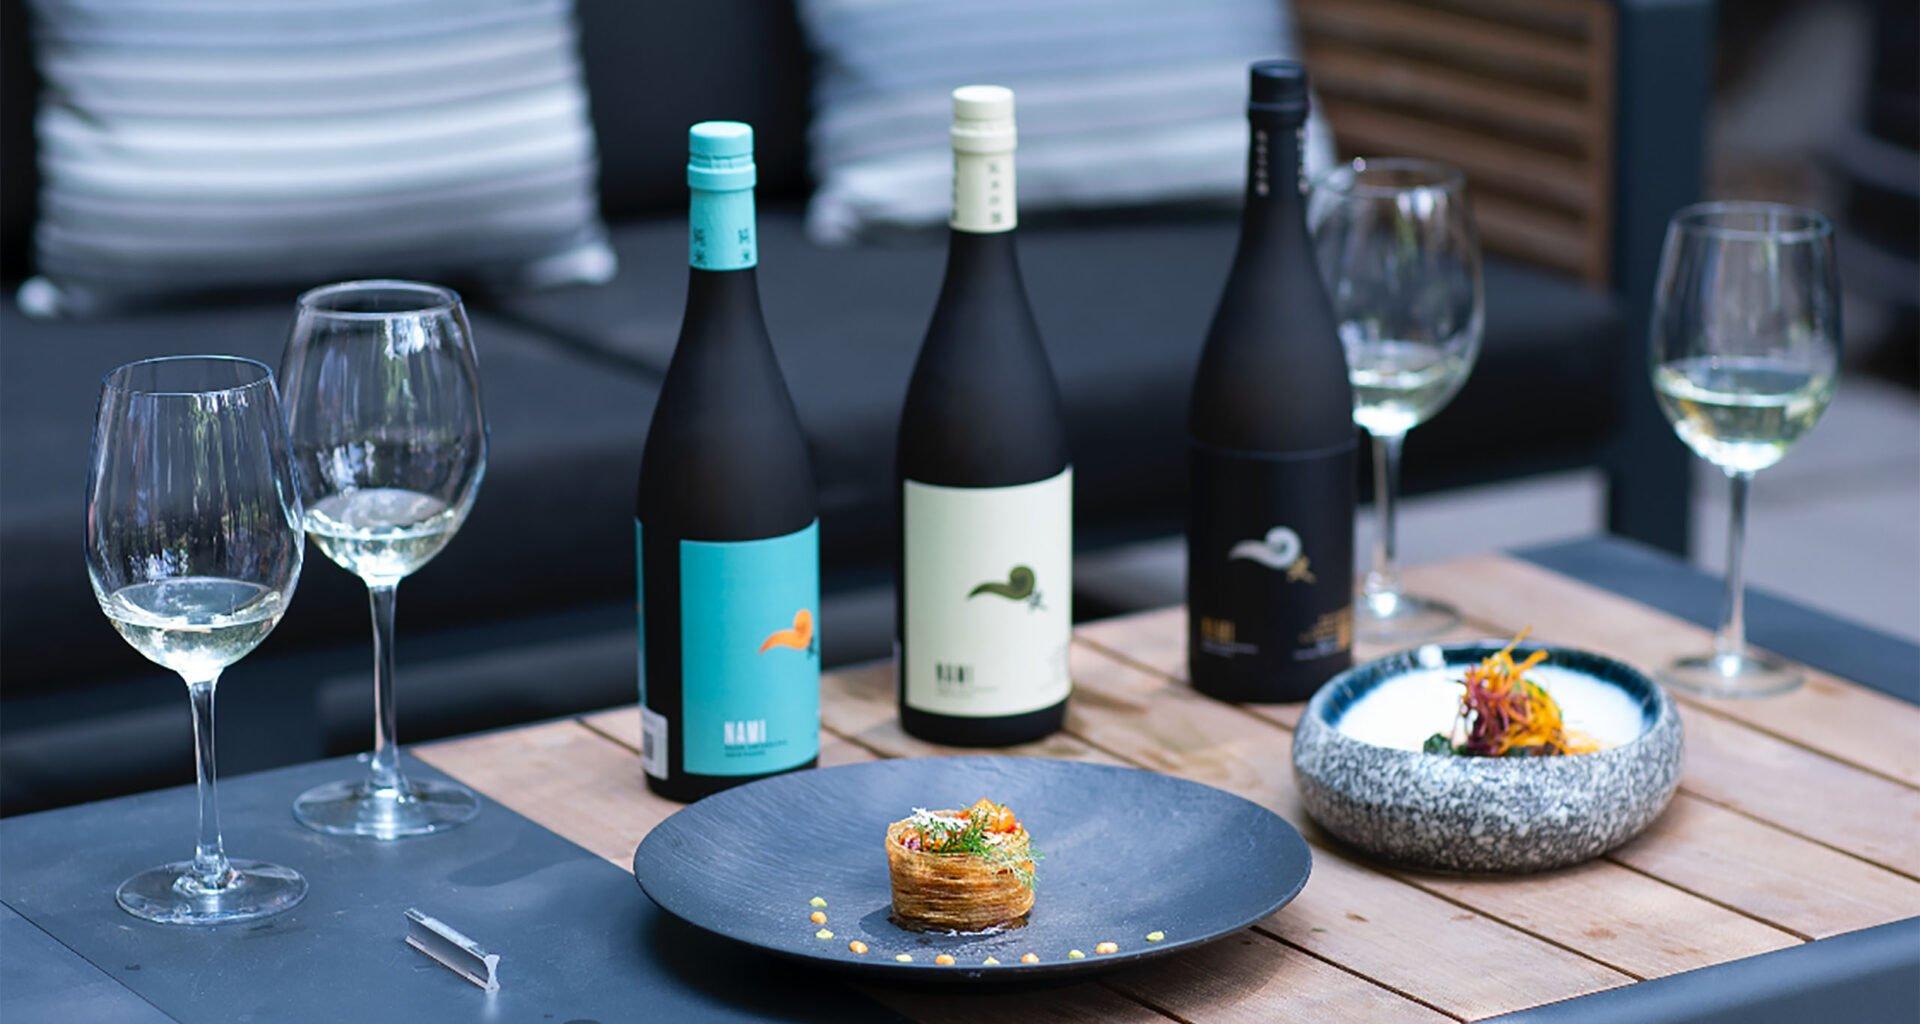 Sake maridaje con mariscos